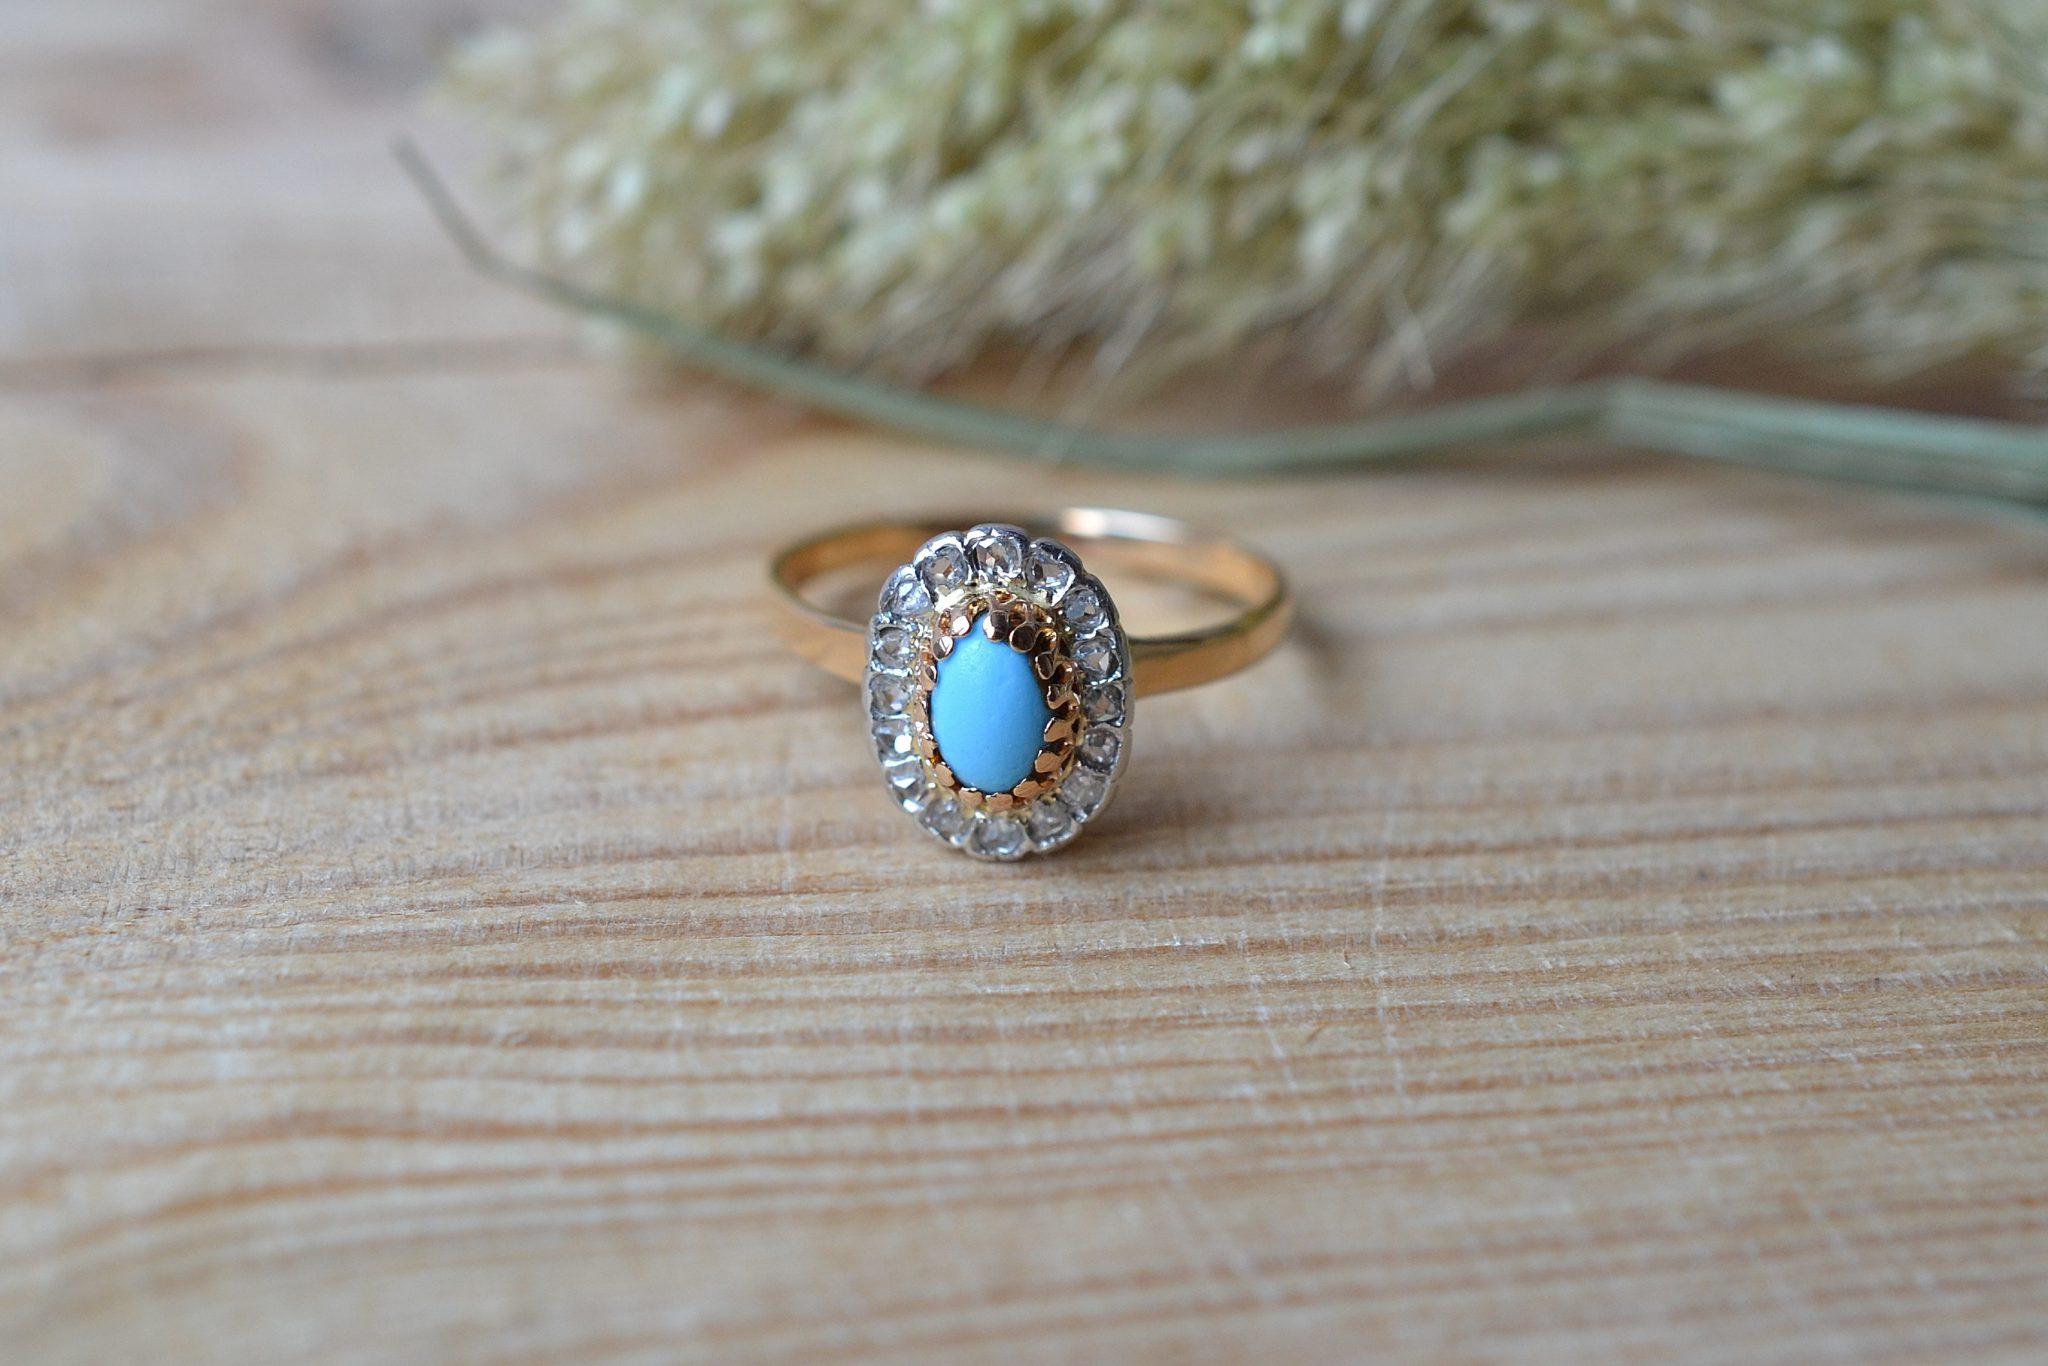 bague-deux-ors-turquoise-bijou-vintage-or-massif